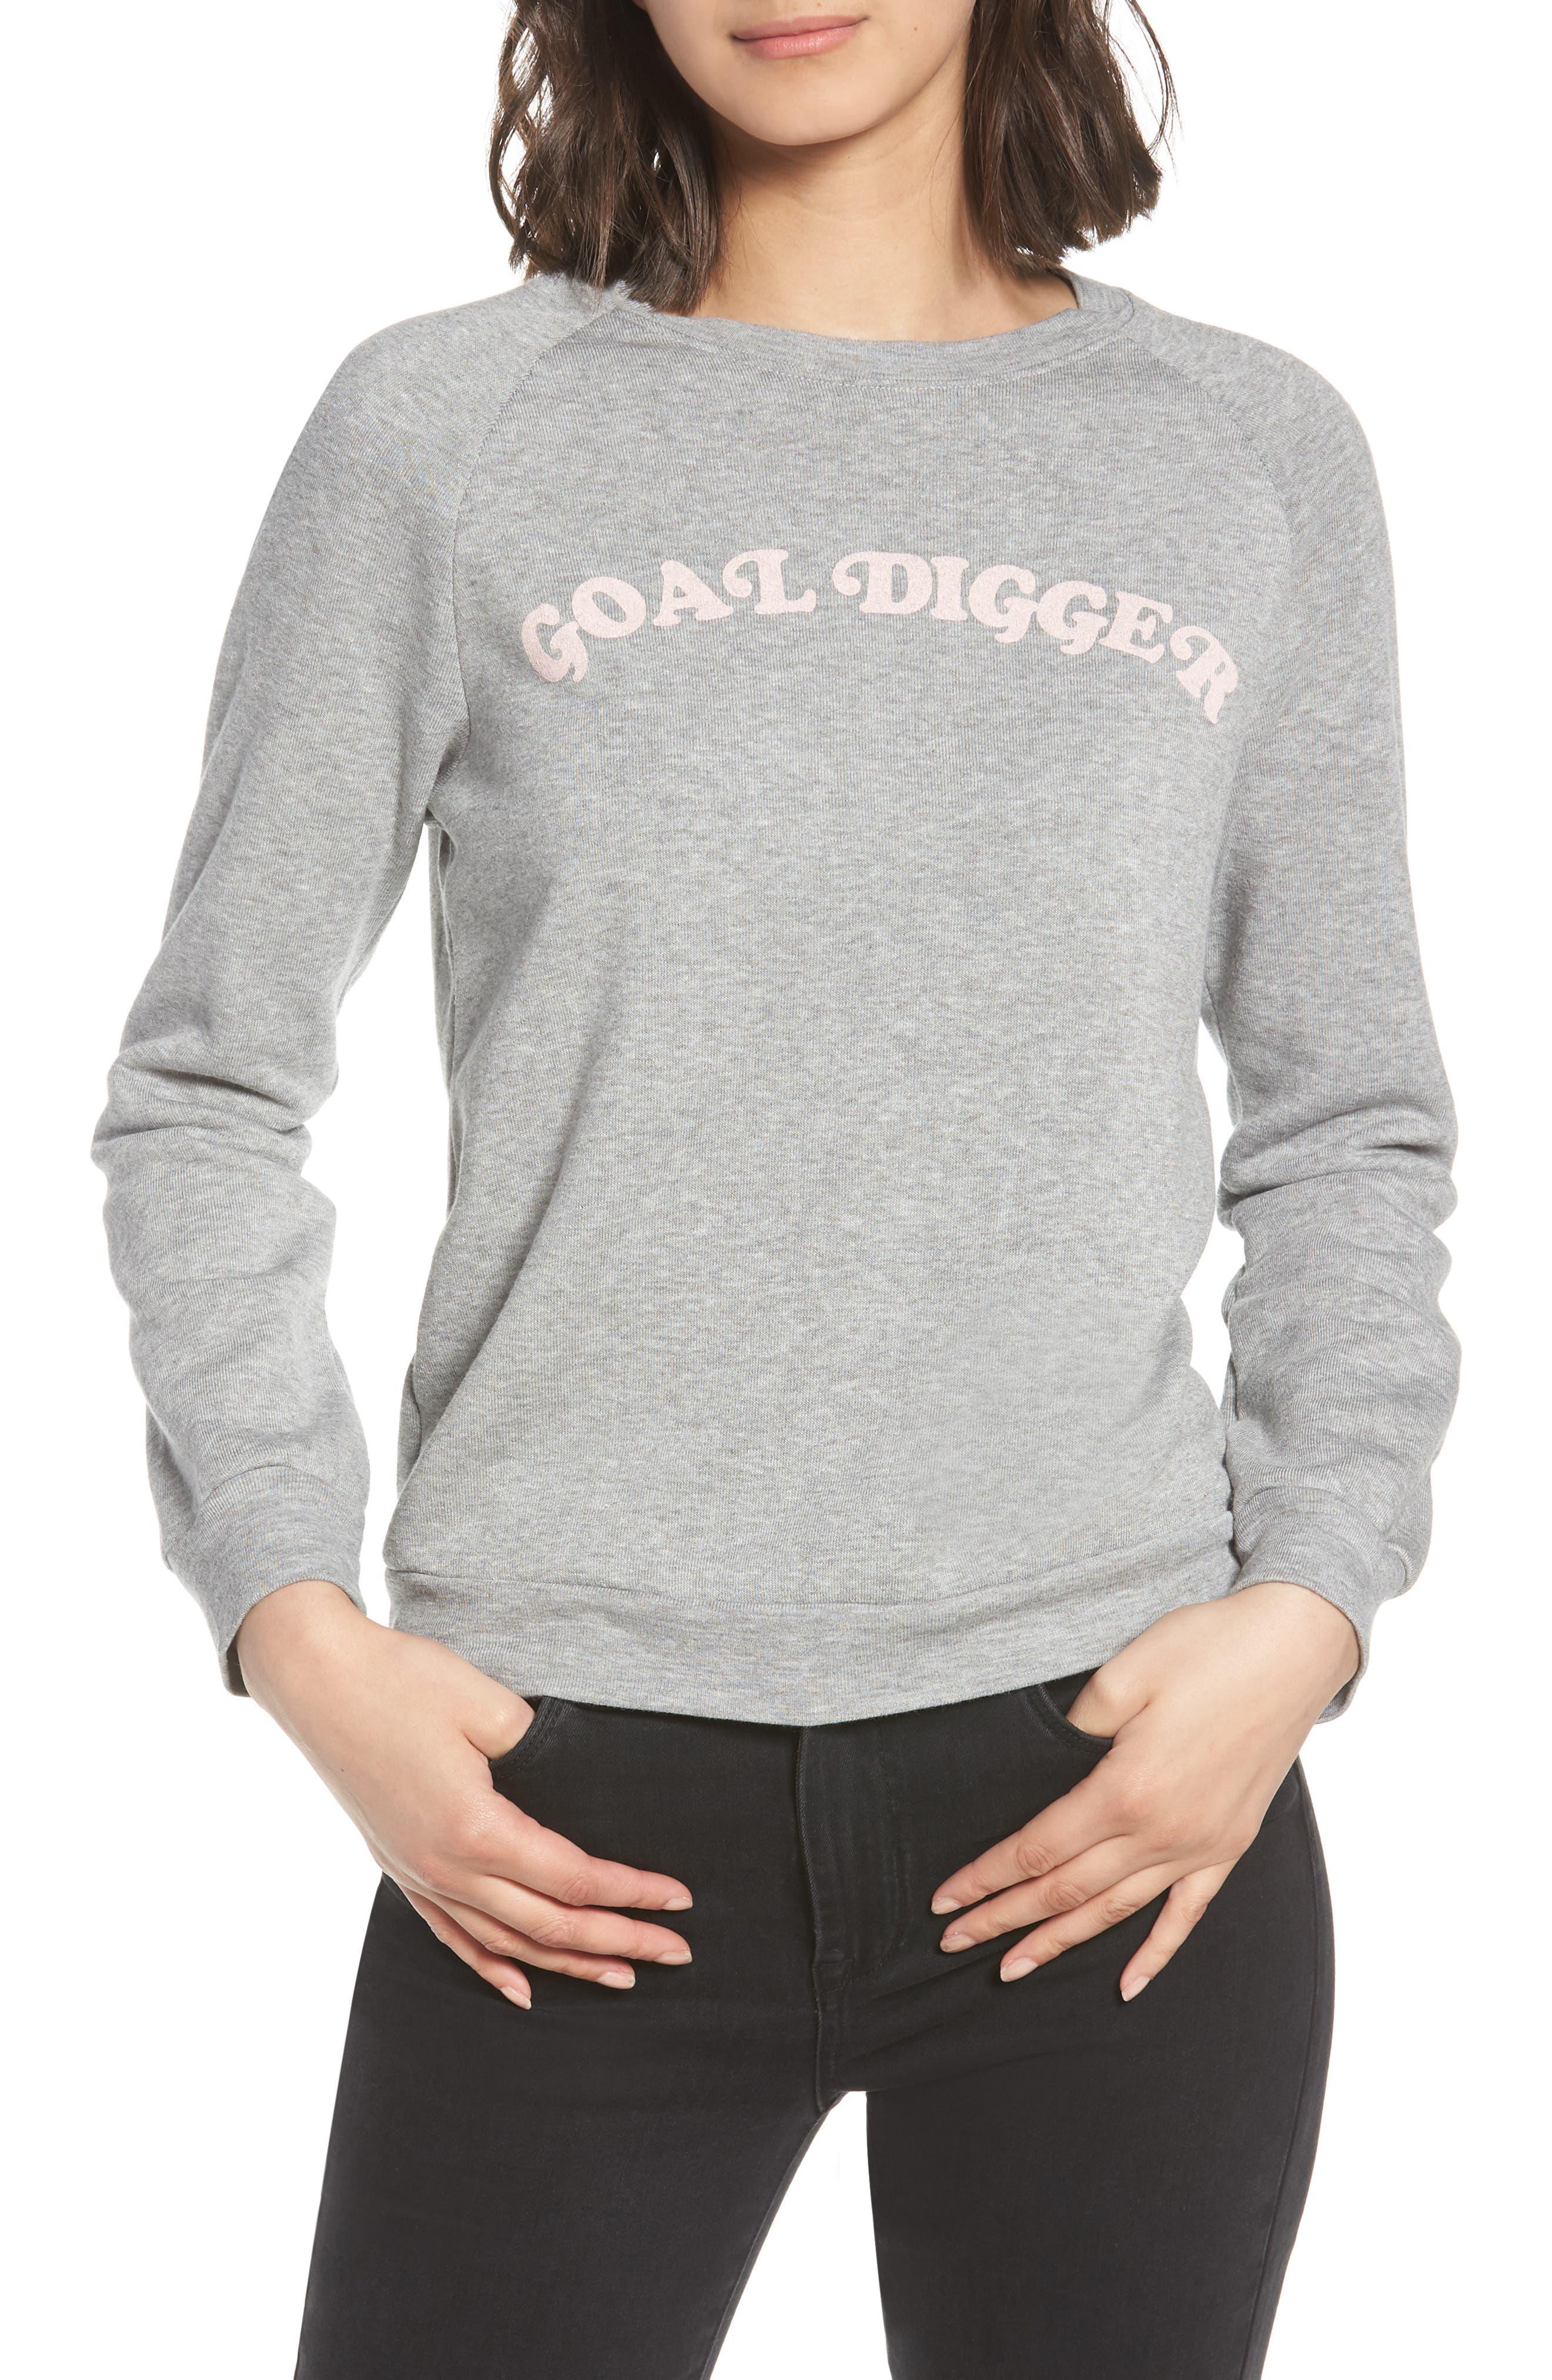 Goal Digger Sweatshirt,                             Main thumbnail 1, color,                             020